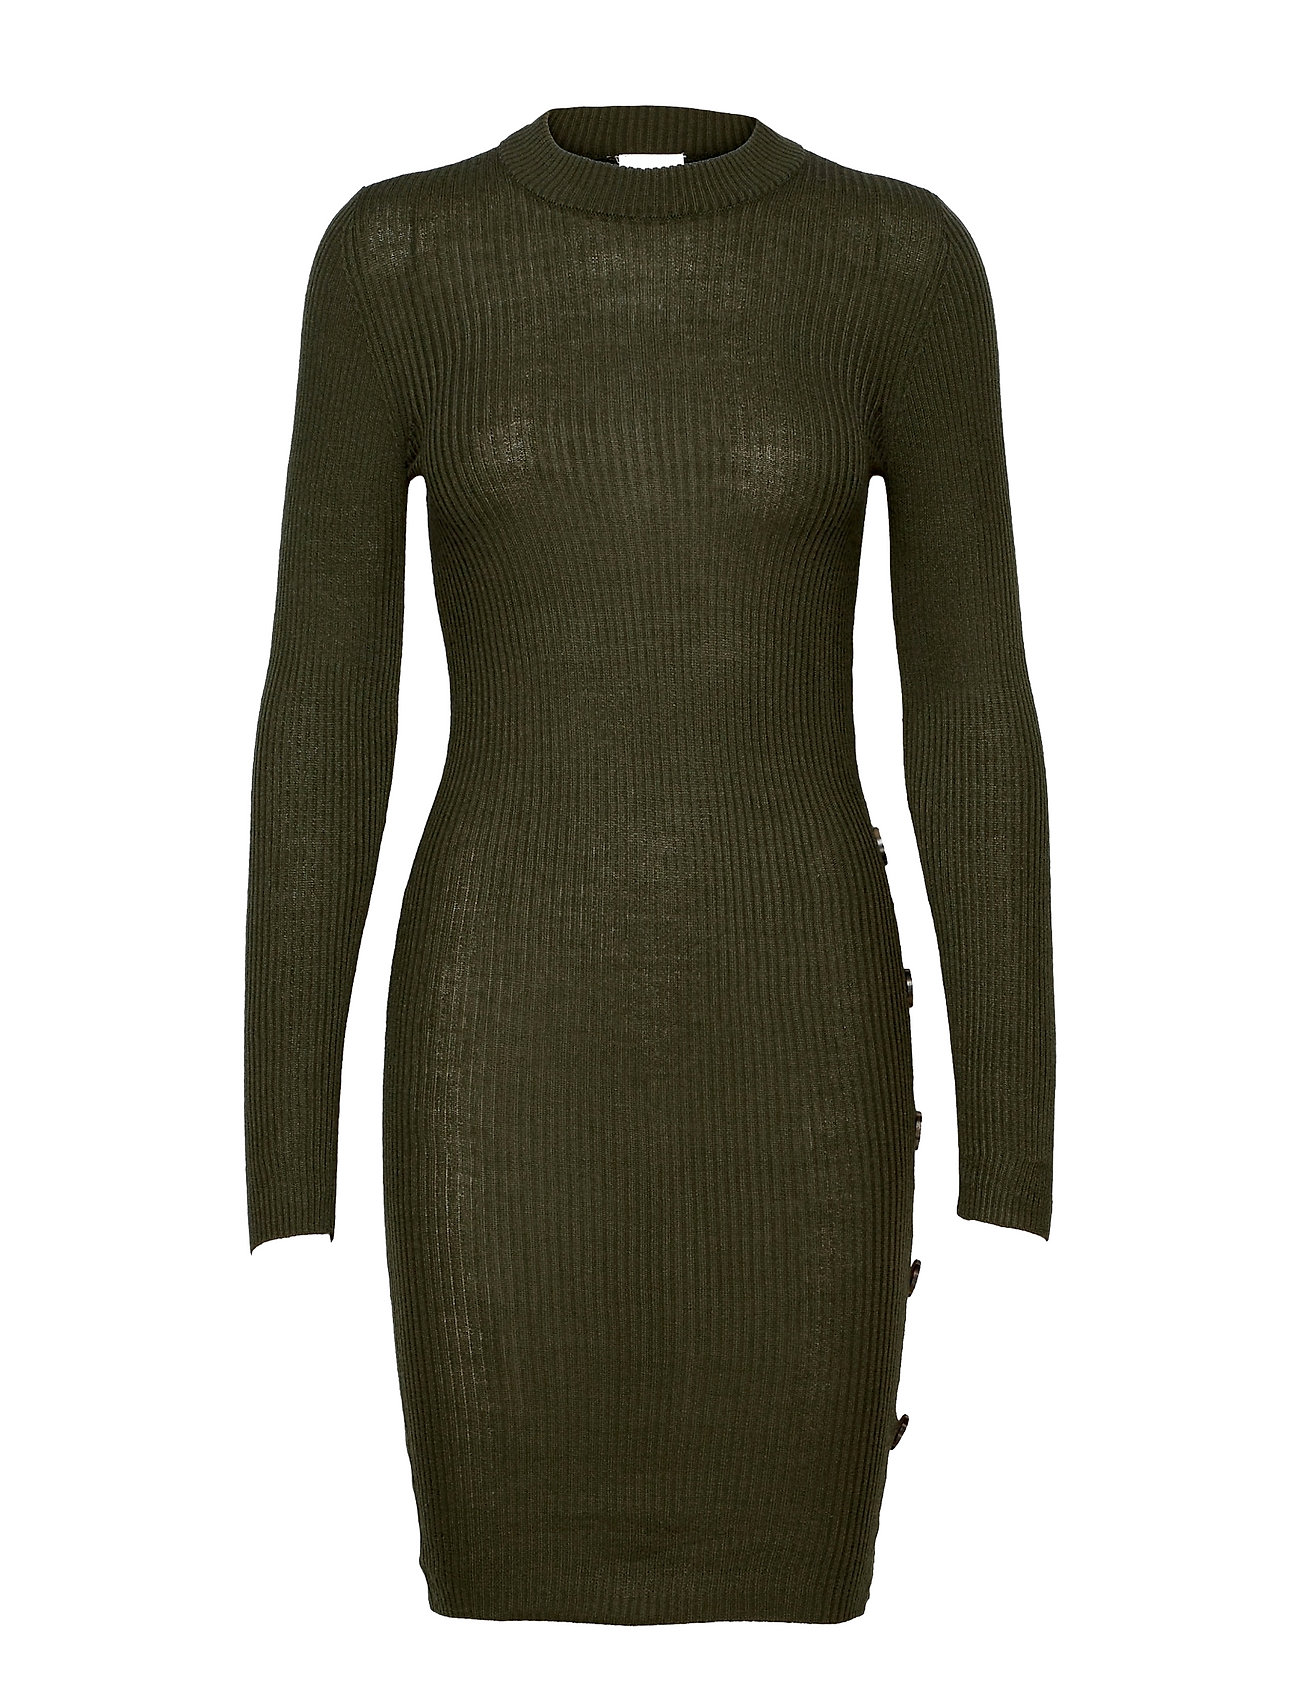 Vimegan L/S Bodycon Knit Dress/Ka Dresses Bodycon Dresses Grøn Vila